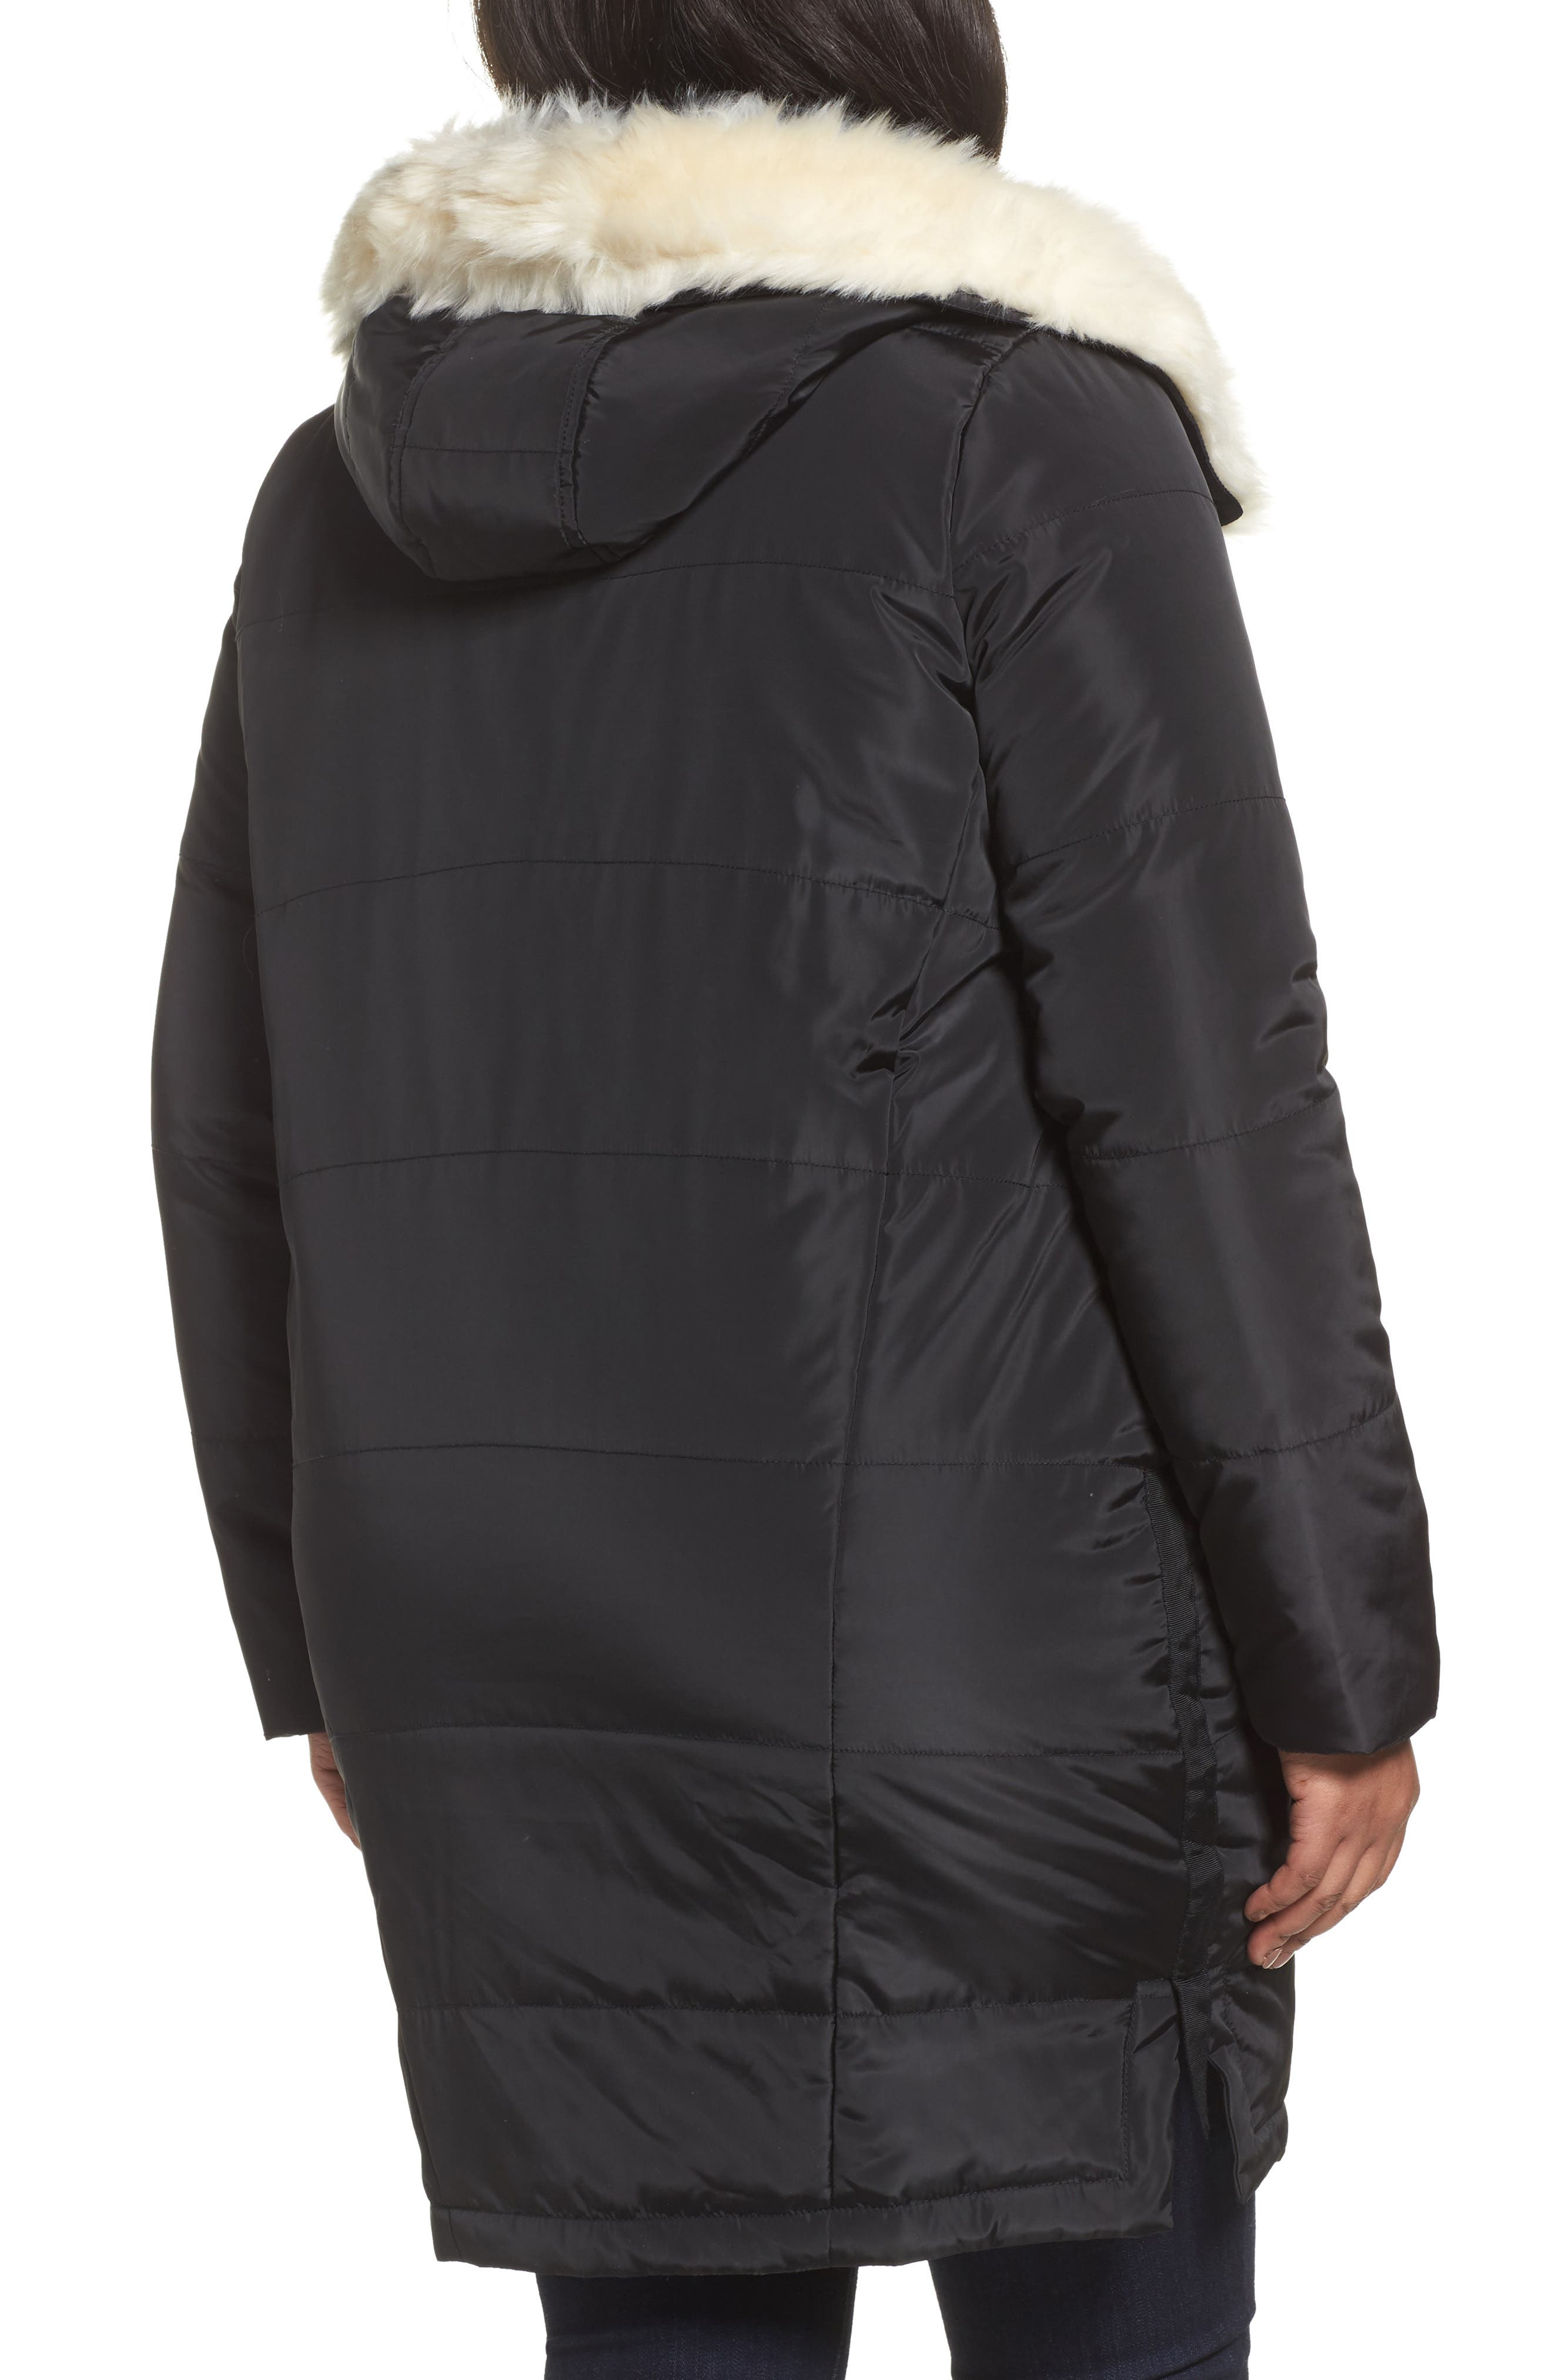 Puffer Coat with Faux Fur Trim,                             Alternate thumbnail 2, color,                             Black